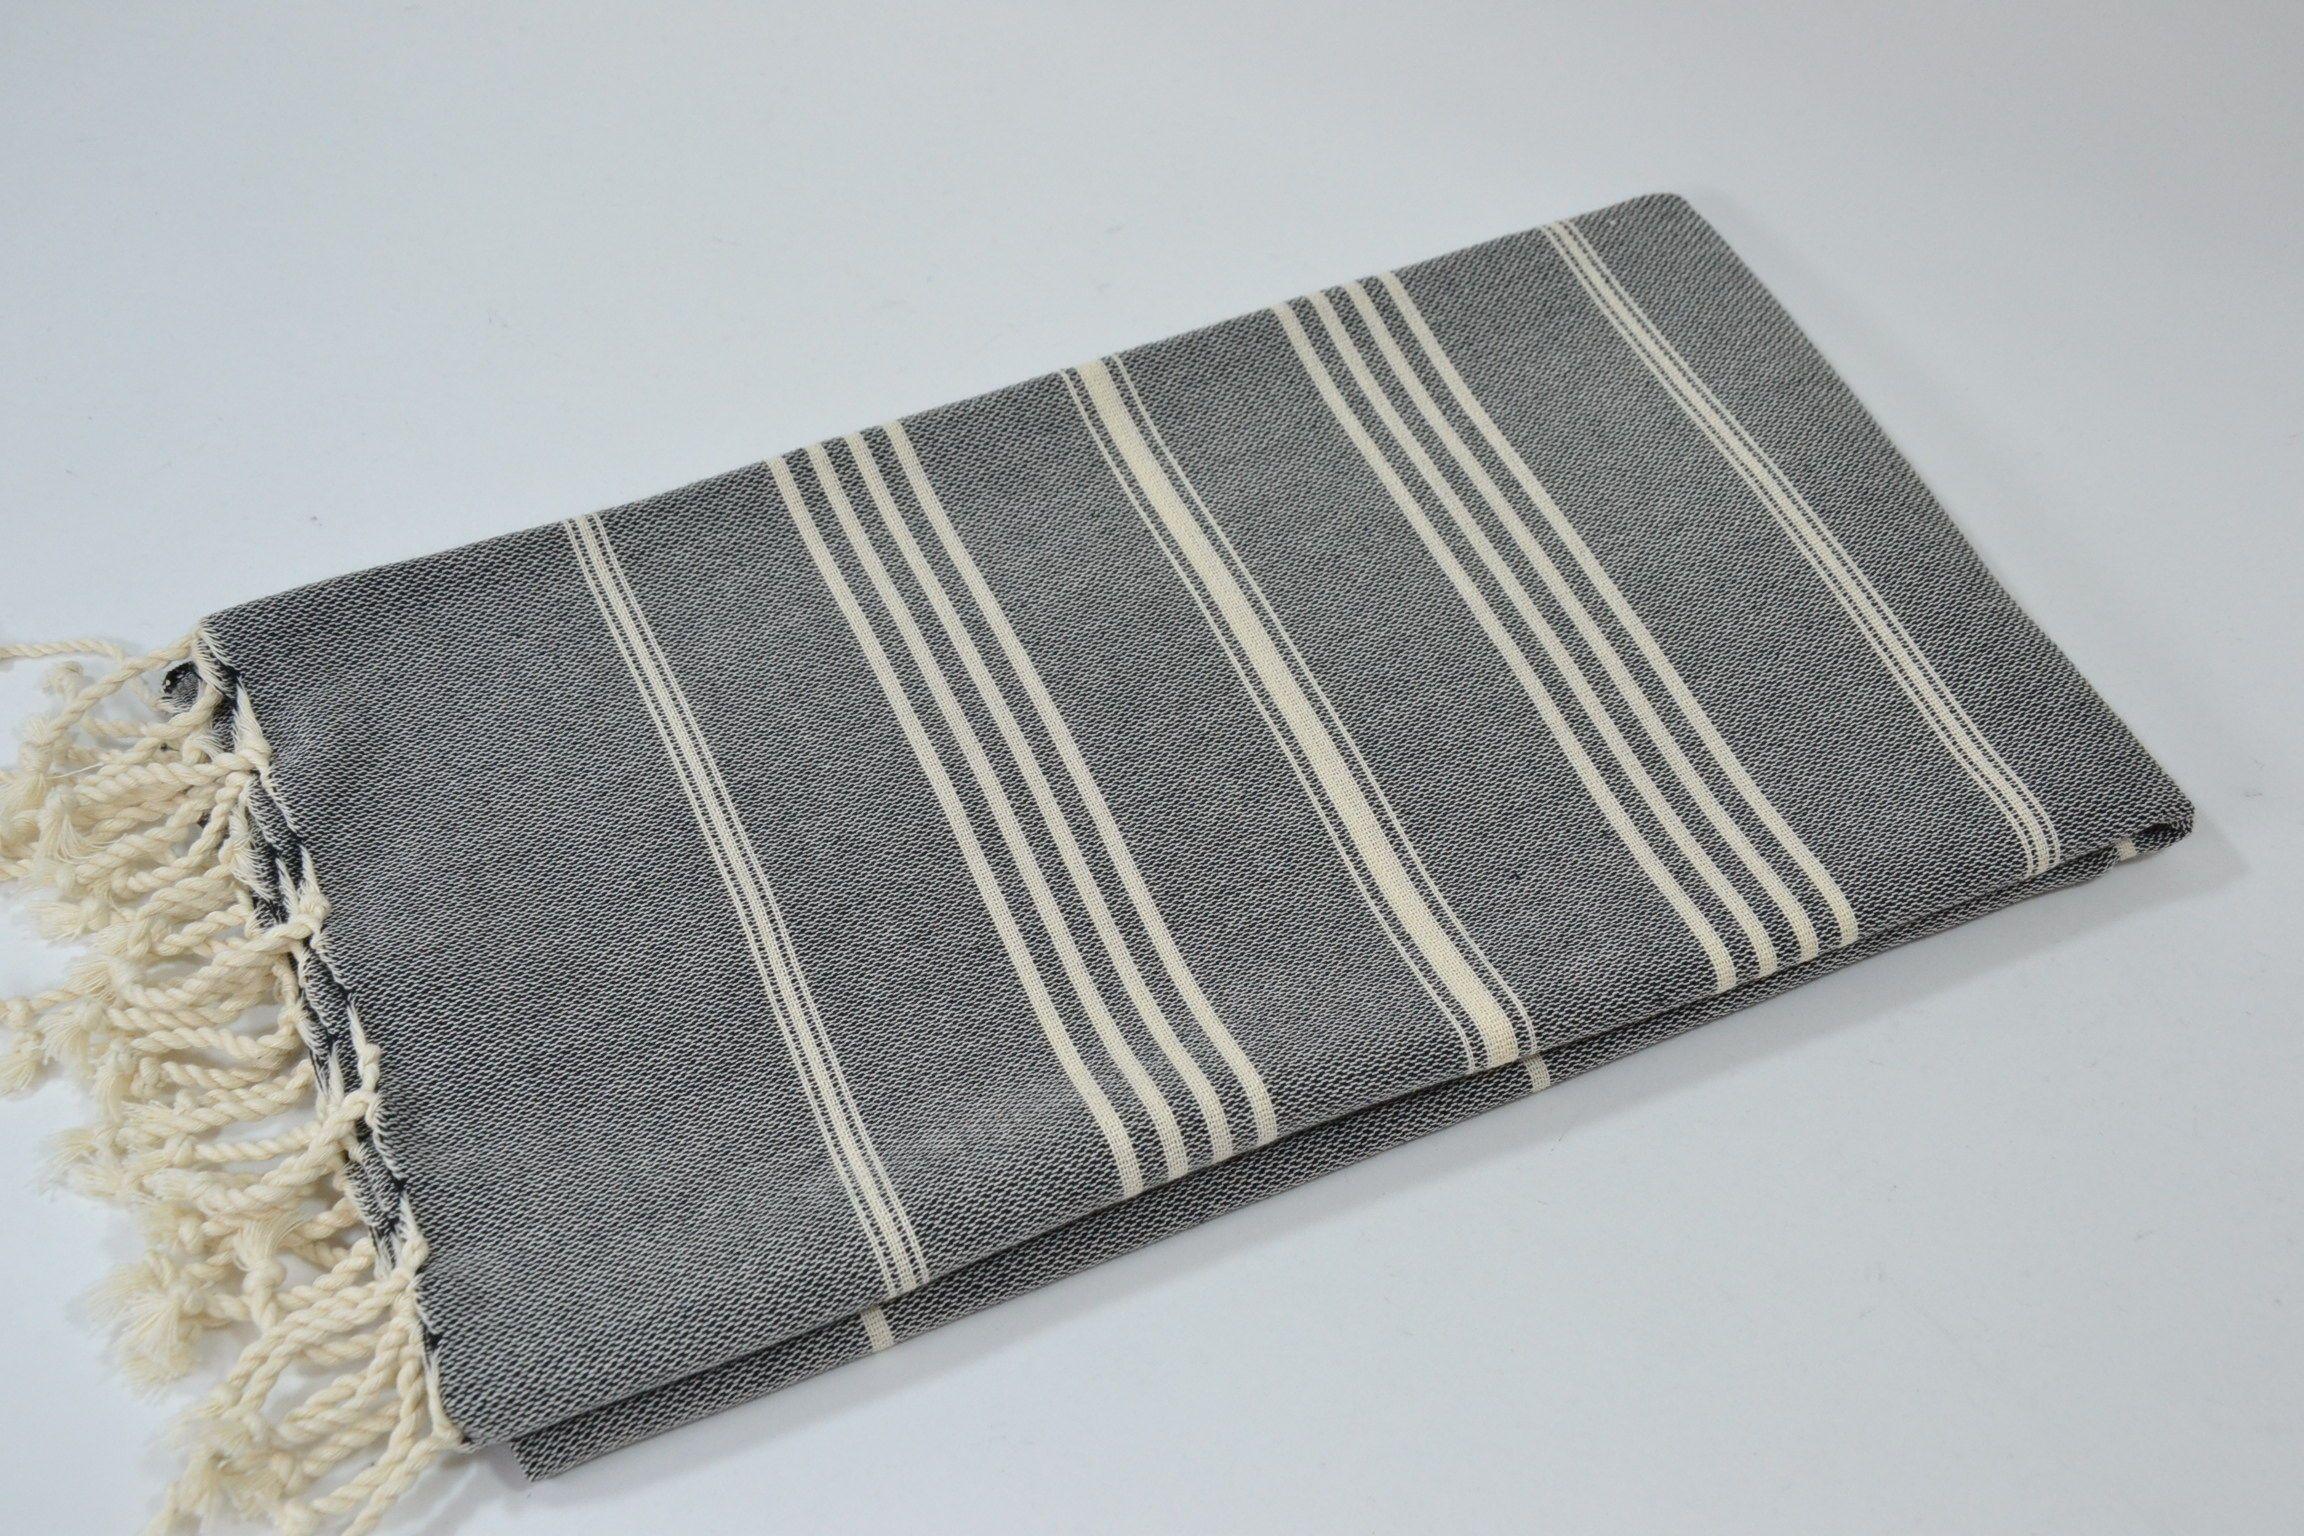 Turkish Towel Towel Peshtemal Towel Beach Towel 40 X70 Bath Towel